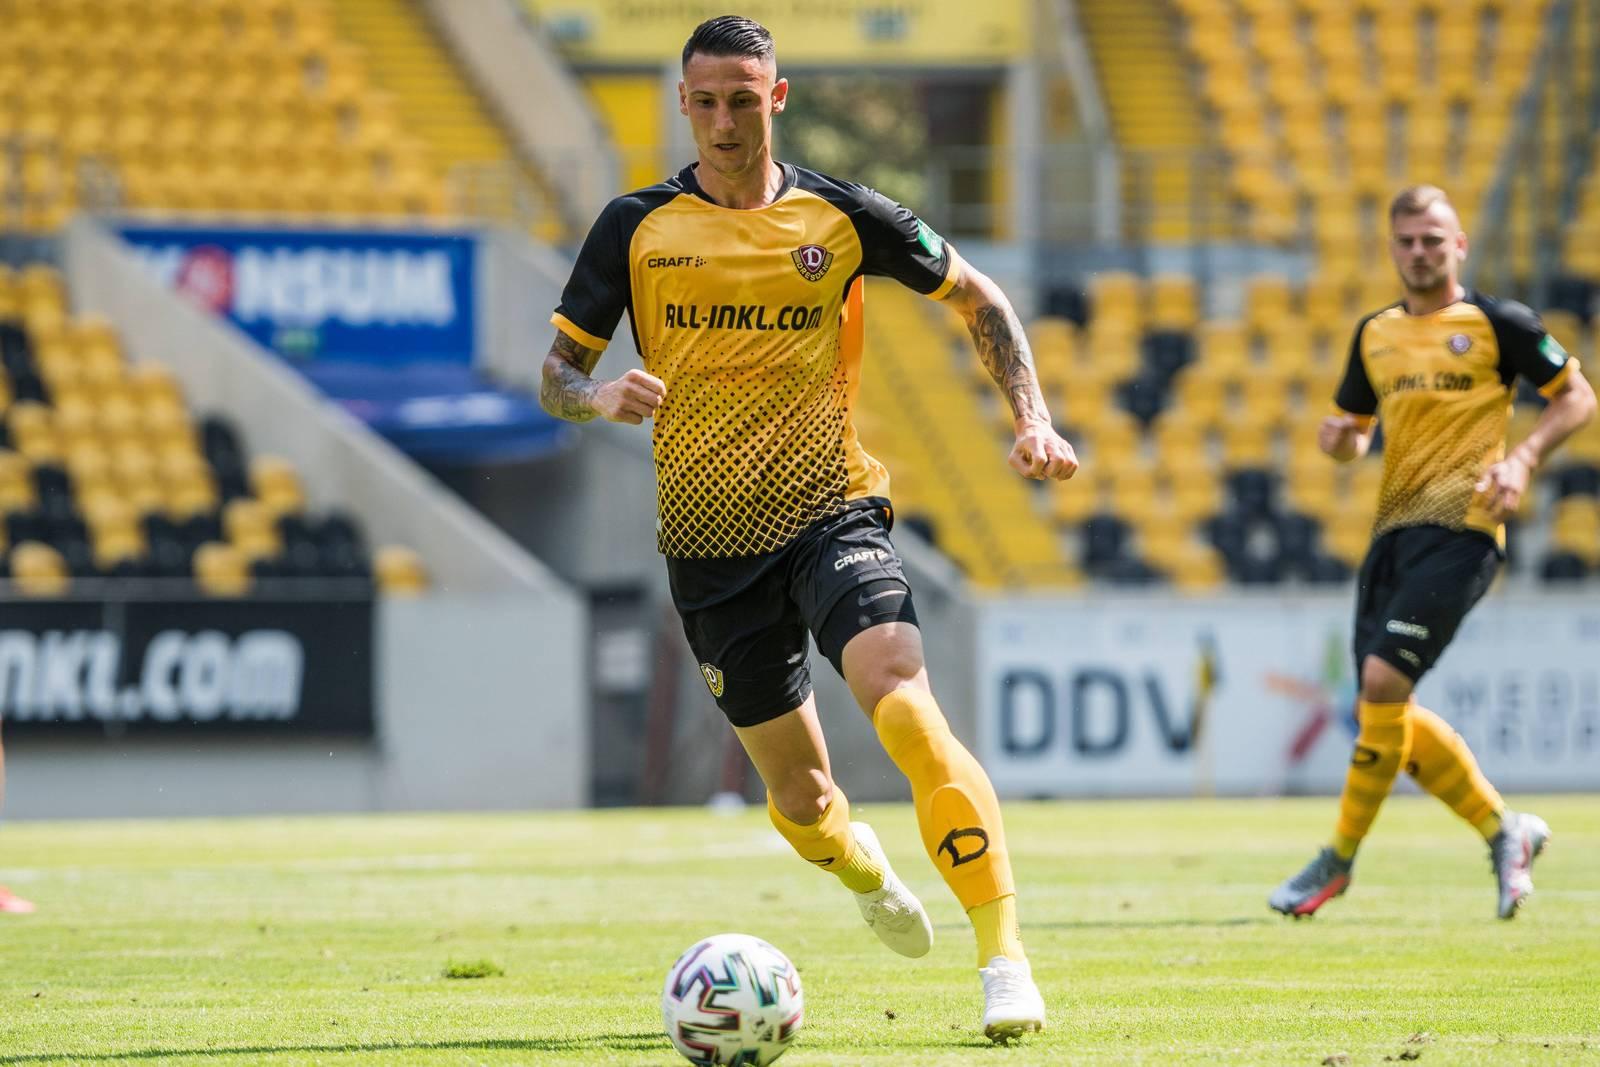 Panagiotis Vlachodimos von Dynamo Dresden